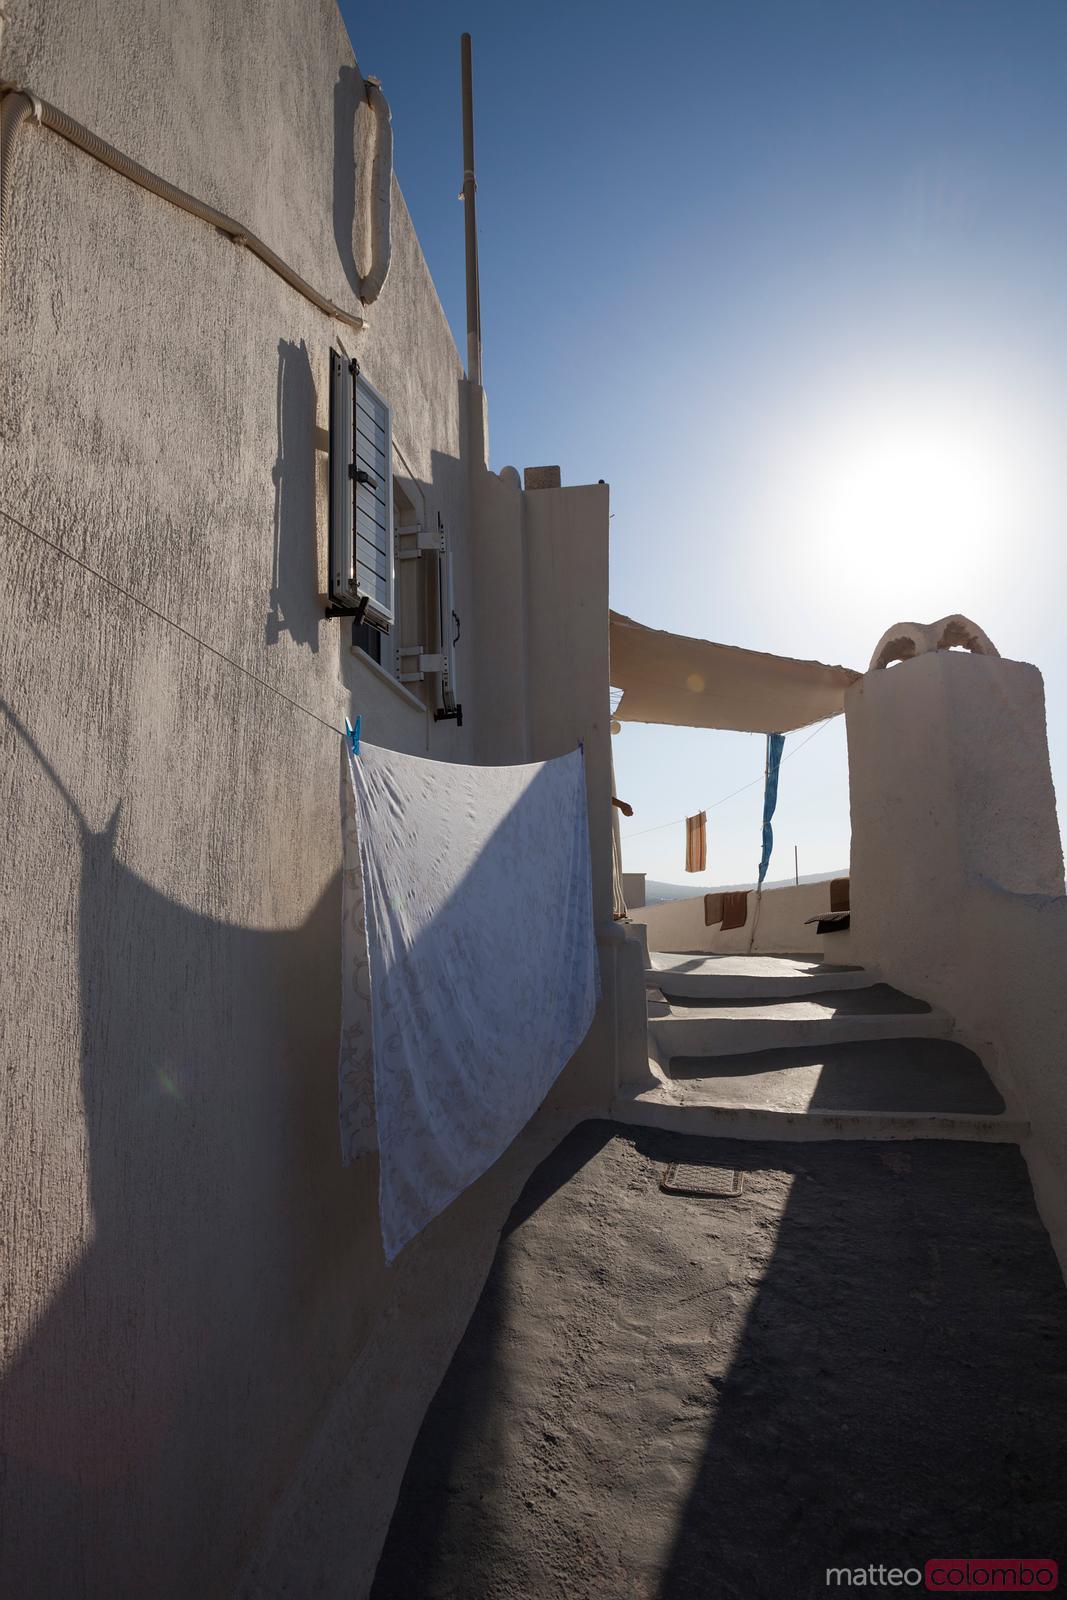 Matteo Colombo Travel Photography